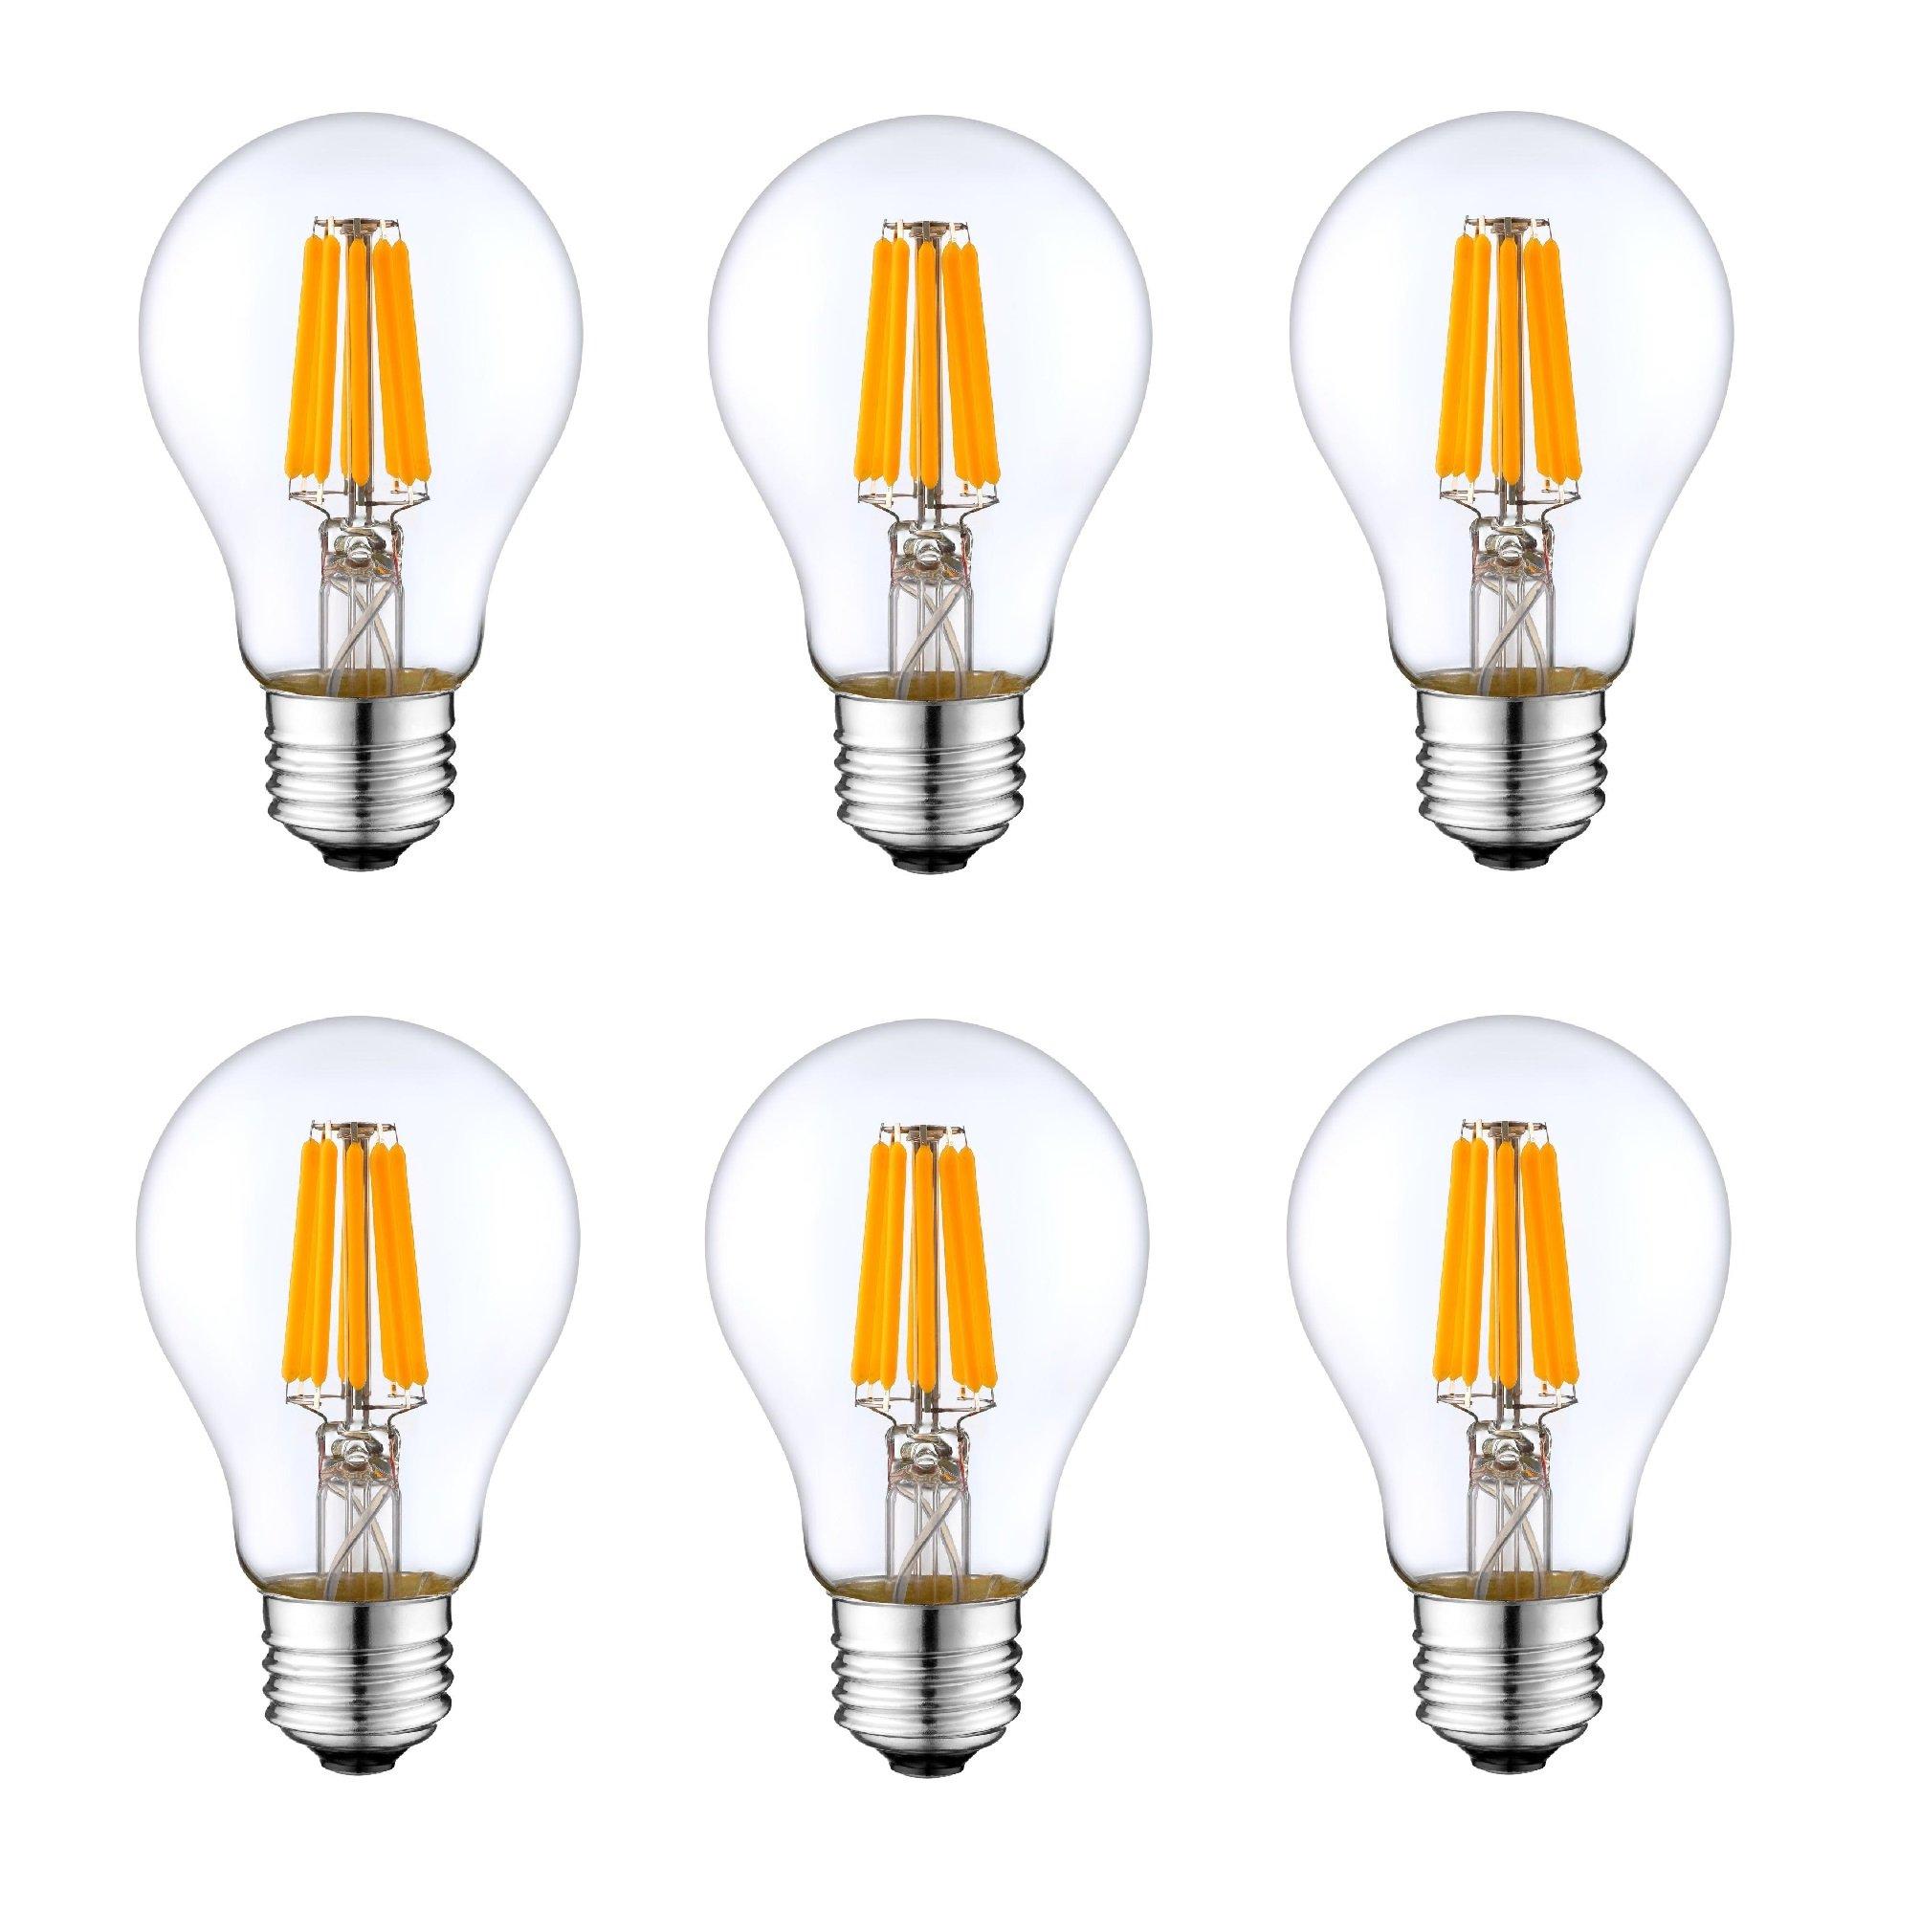 12V E26 Light Bulb A19 PURE WHITE 6000k 4W LED Edison 12 Volt Classic Medium Base Lamp Low Voltage Battery System RV Marine Boat Solar Train Retro Landscaping Van Industrial DC Grid Lighting - 6 Pack